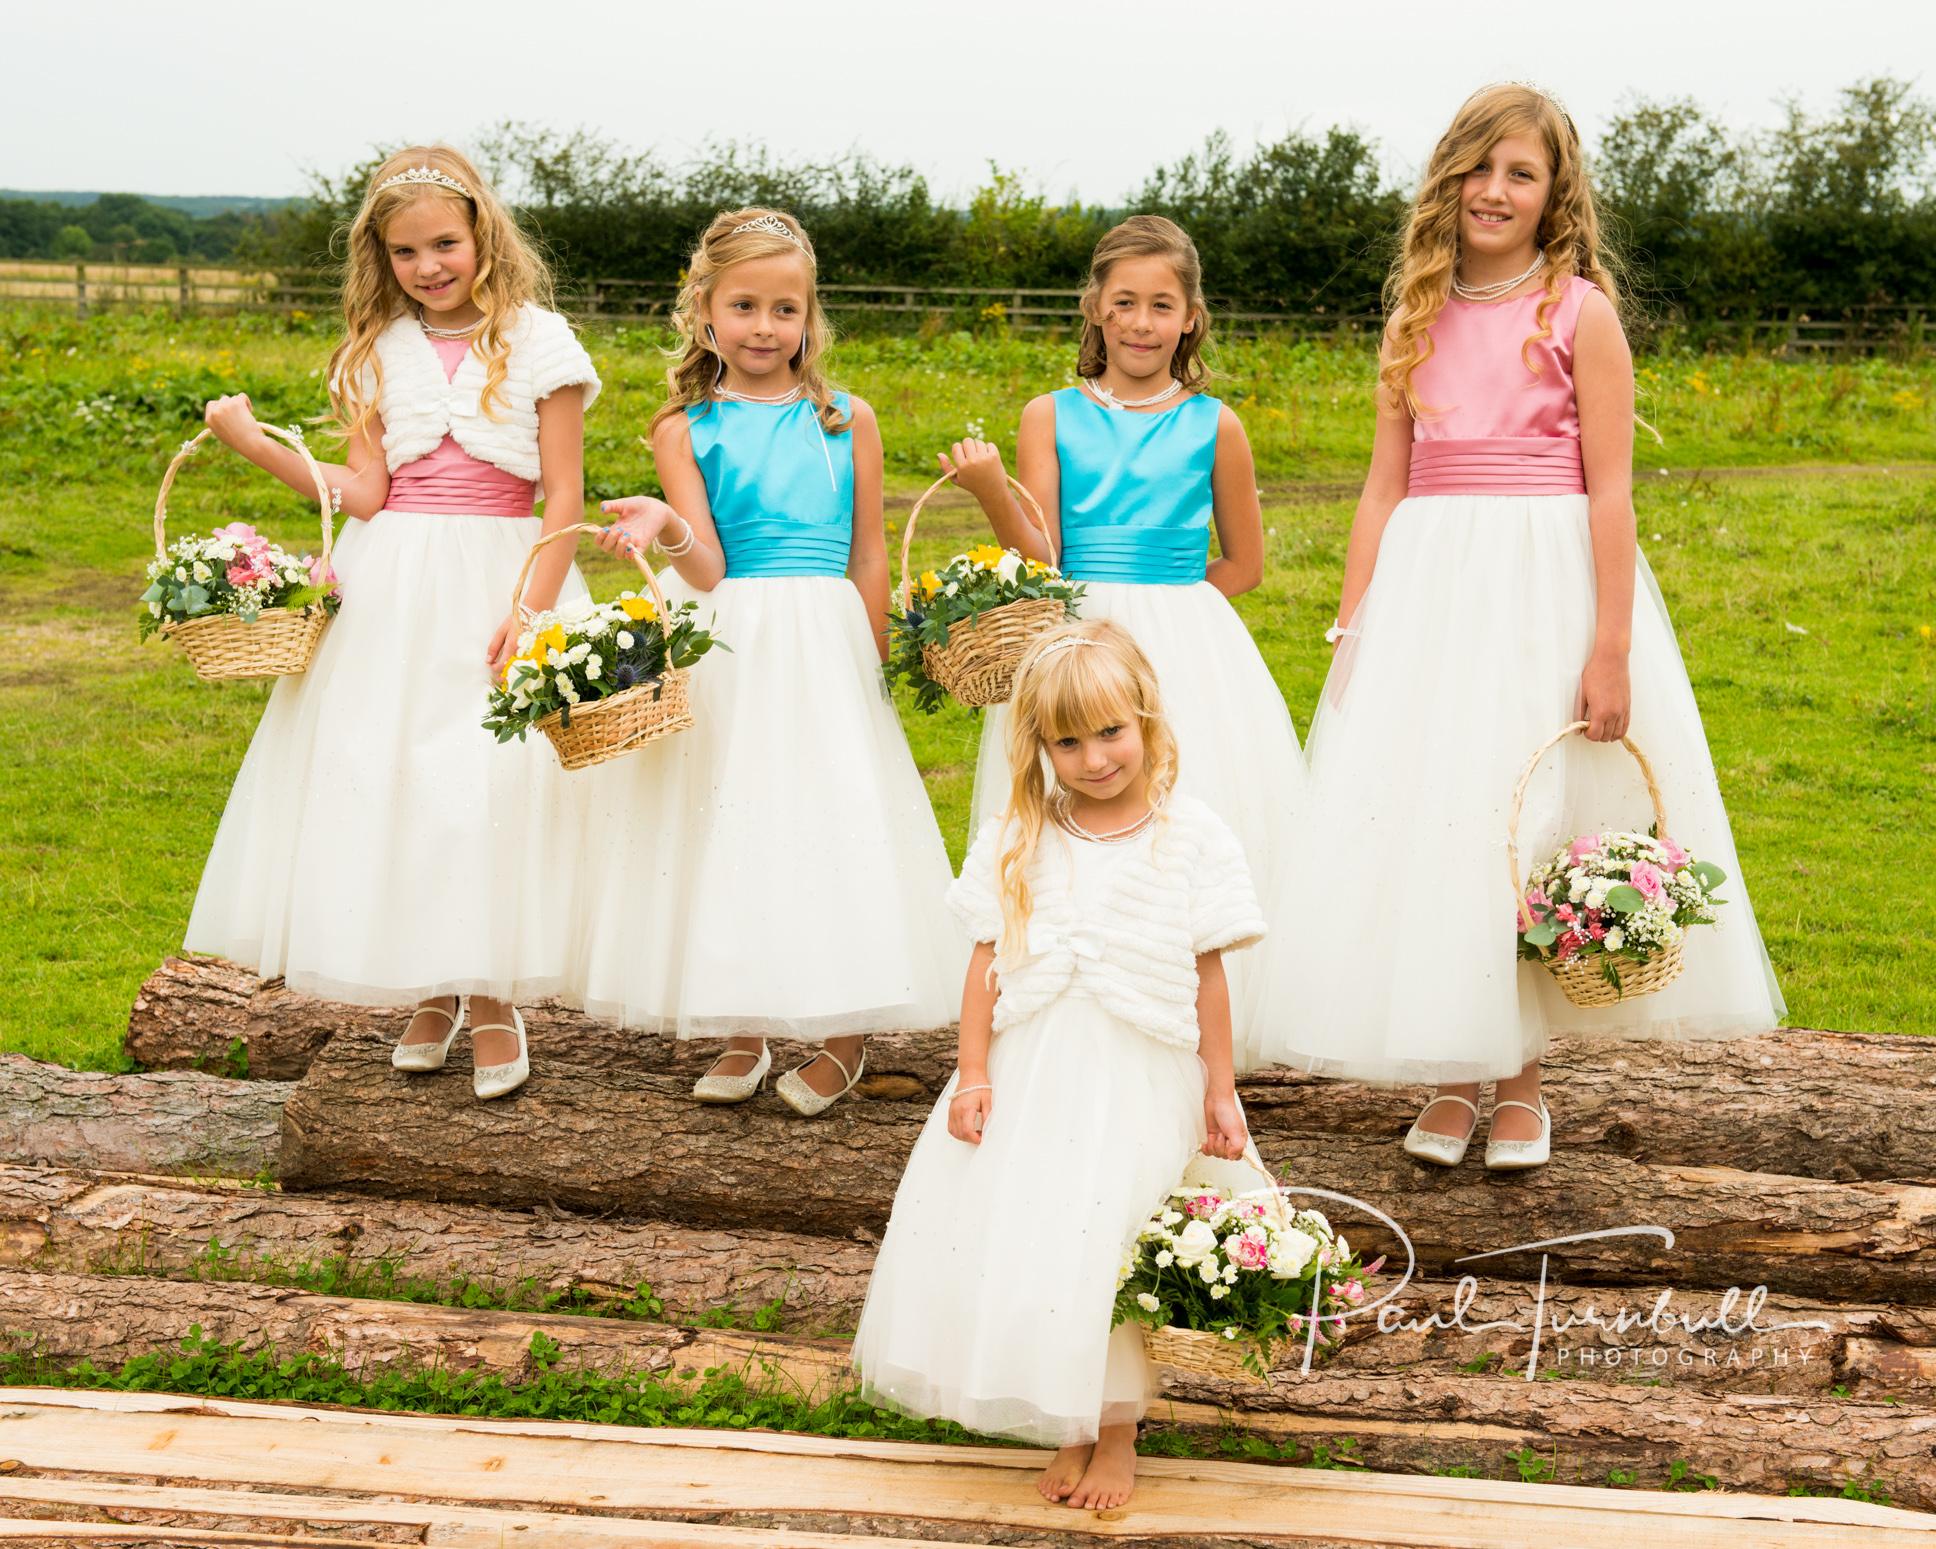 wedding-photography-star-inn-harome-yorkshire-017.jpg